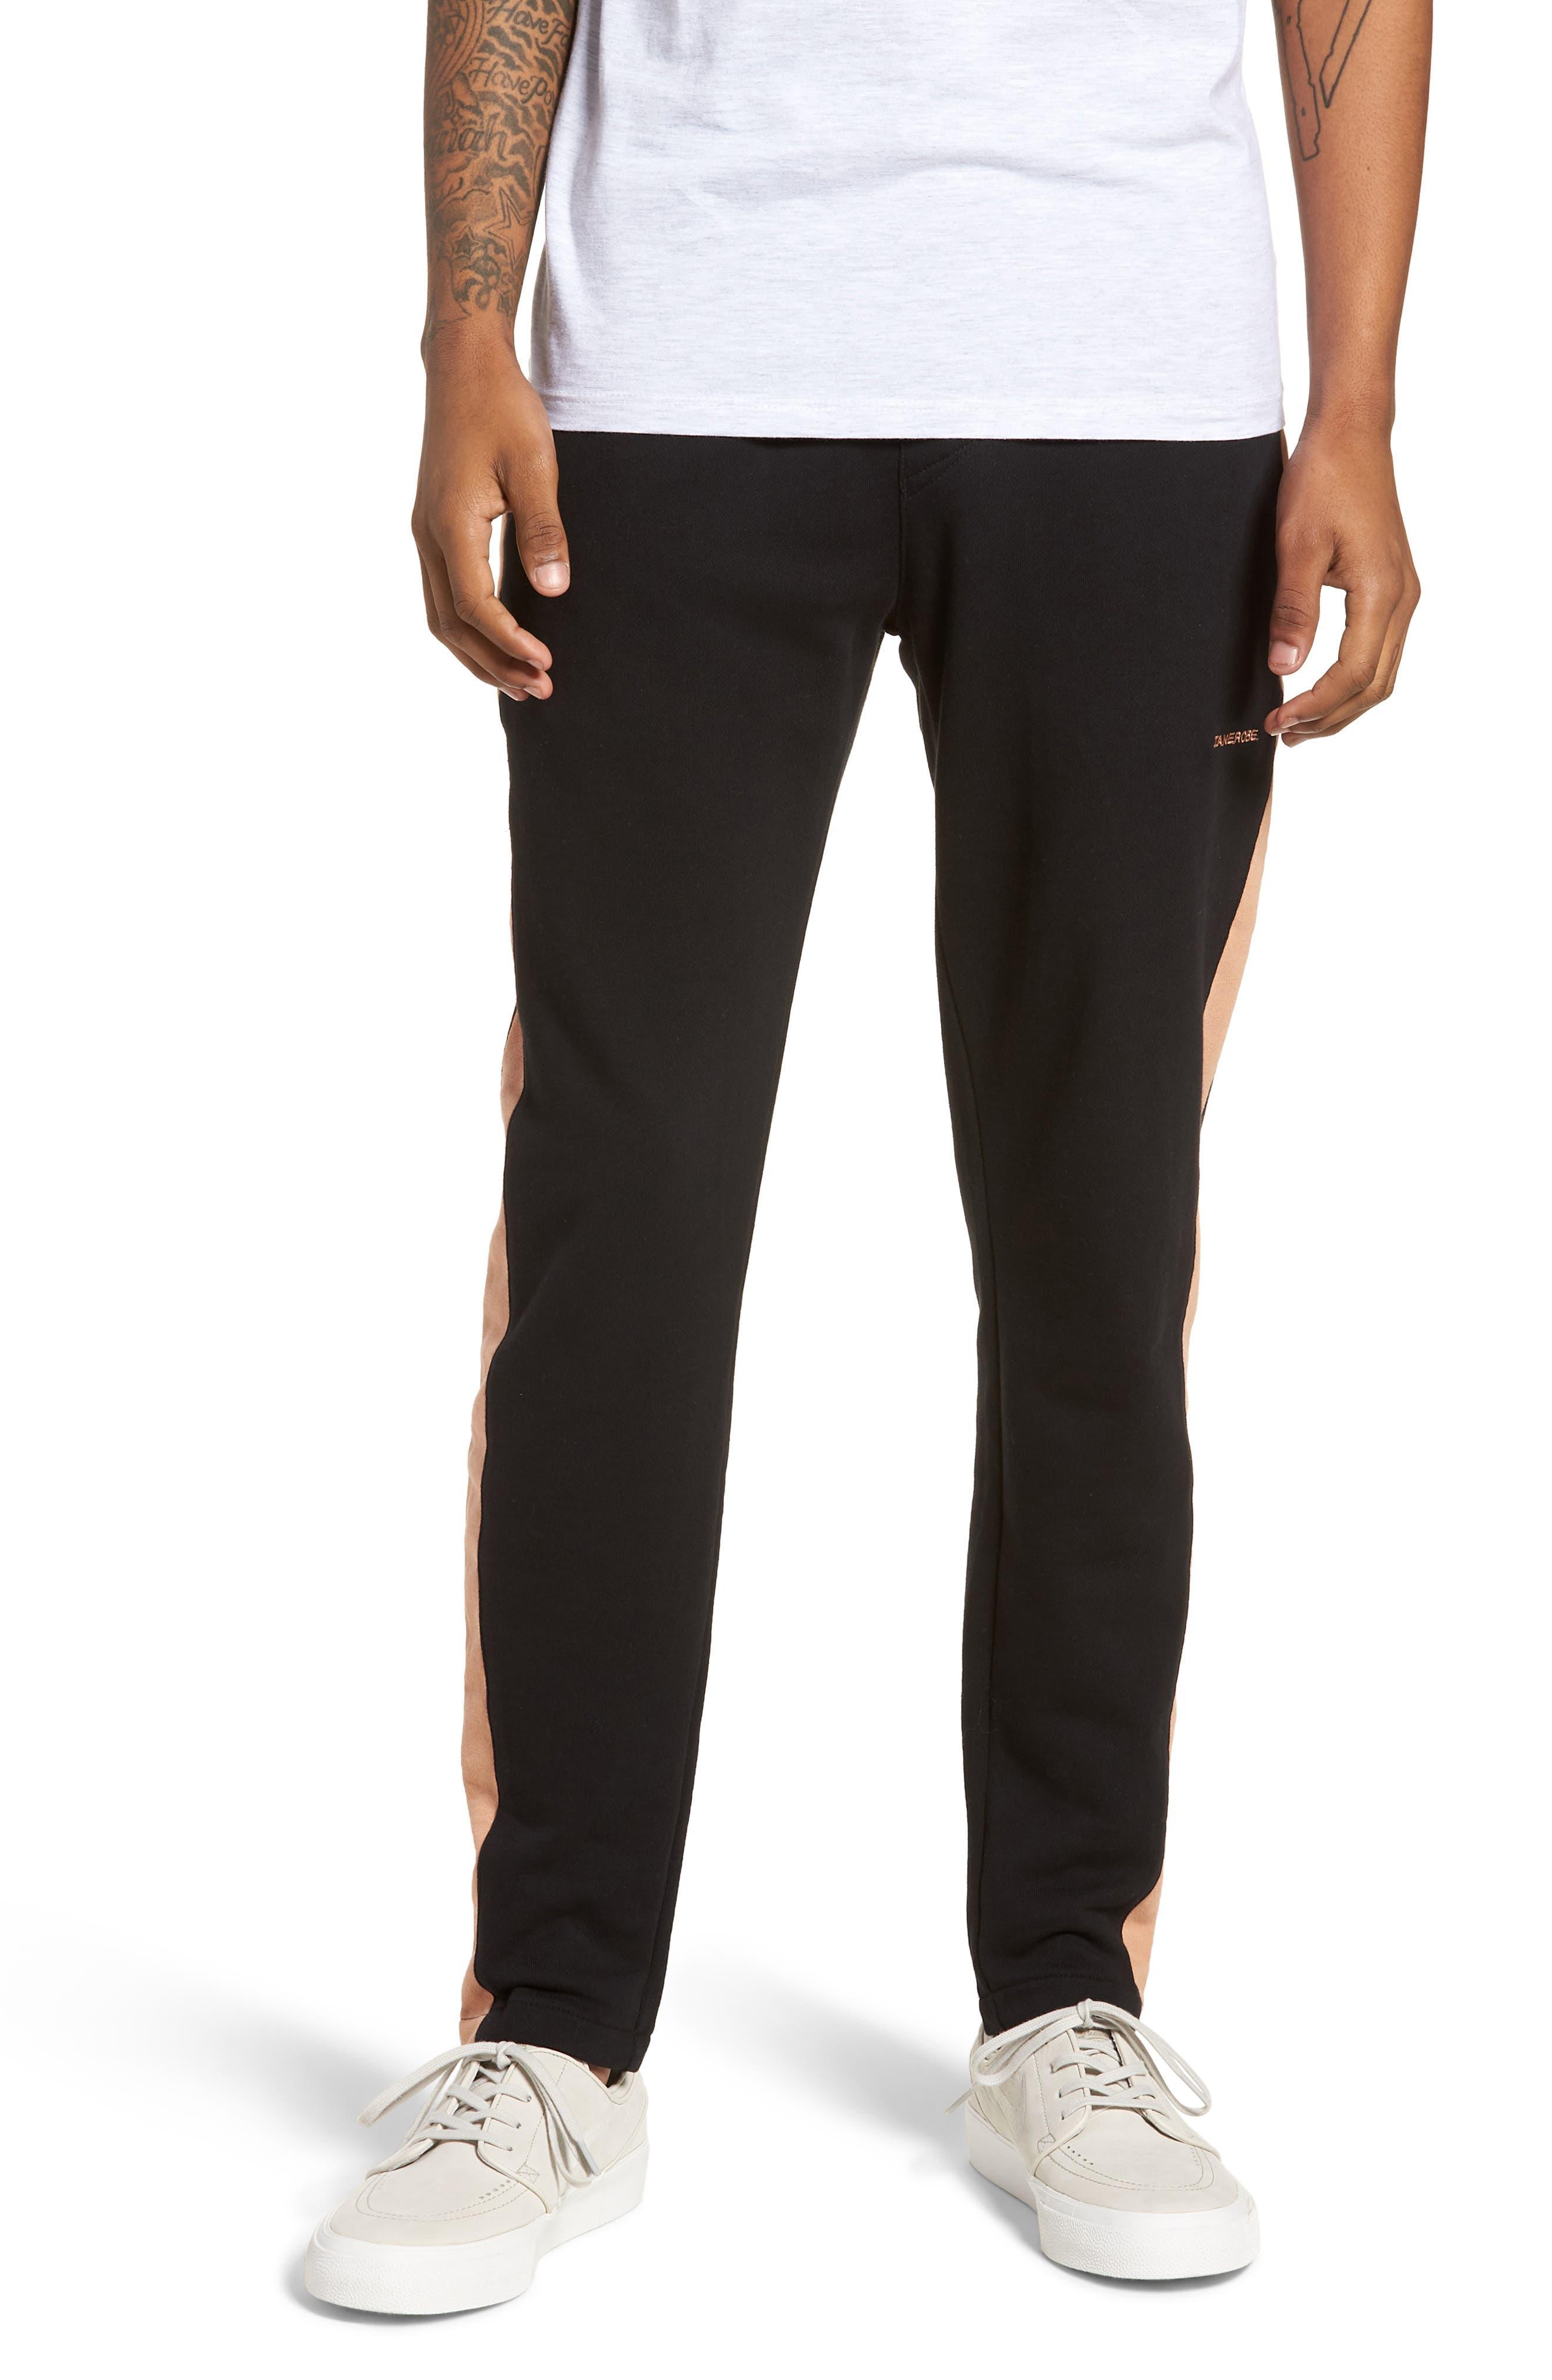 Jumpshot Slim Track Pants,                             Main thumbnail 1, color,                             BLACK/ BISCUIT